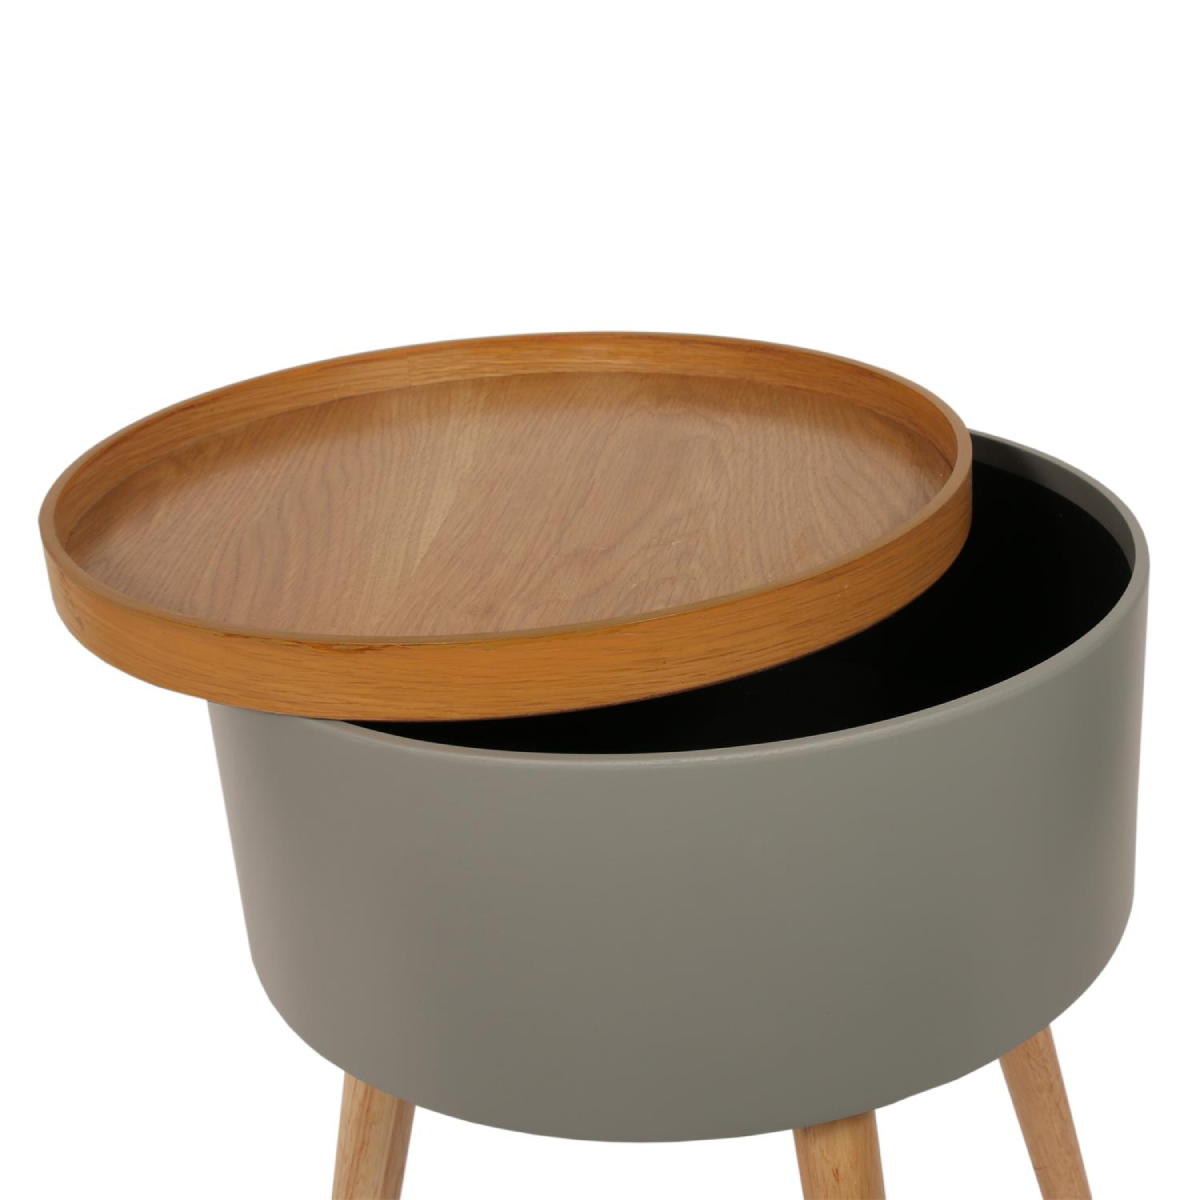 etag re en bois et cuir aeris. Black Bedroom Furniture Sets. Home Design Ideas